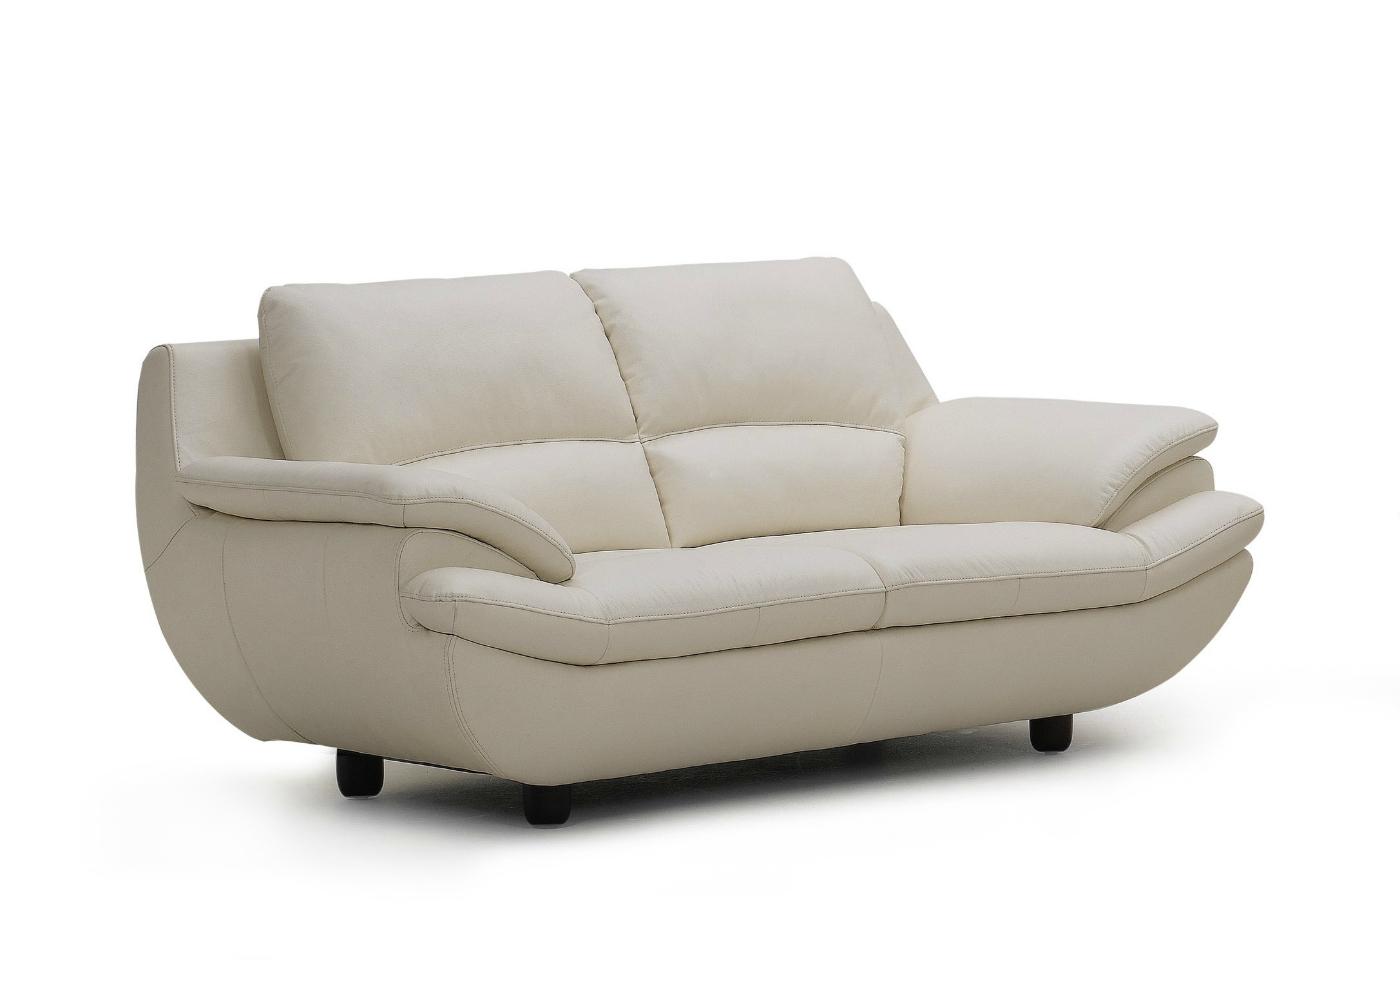 Plush Leather Sofa In Off White 2 1235 2R. Plush Leather Sofa In Off White   Not Just Brown